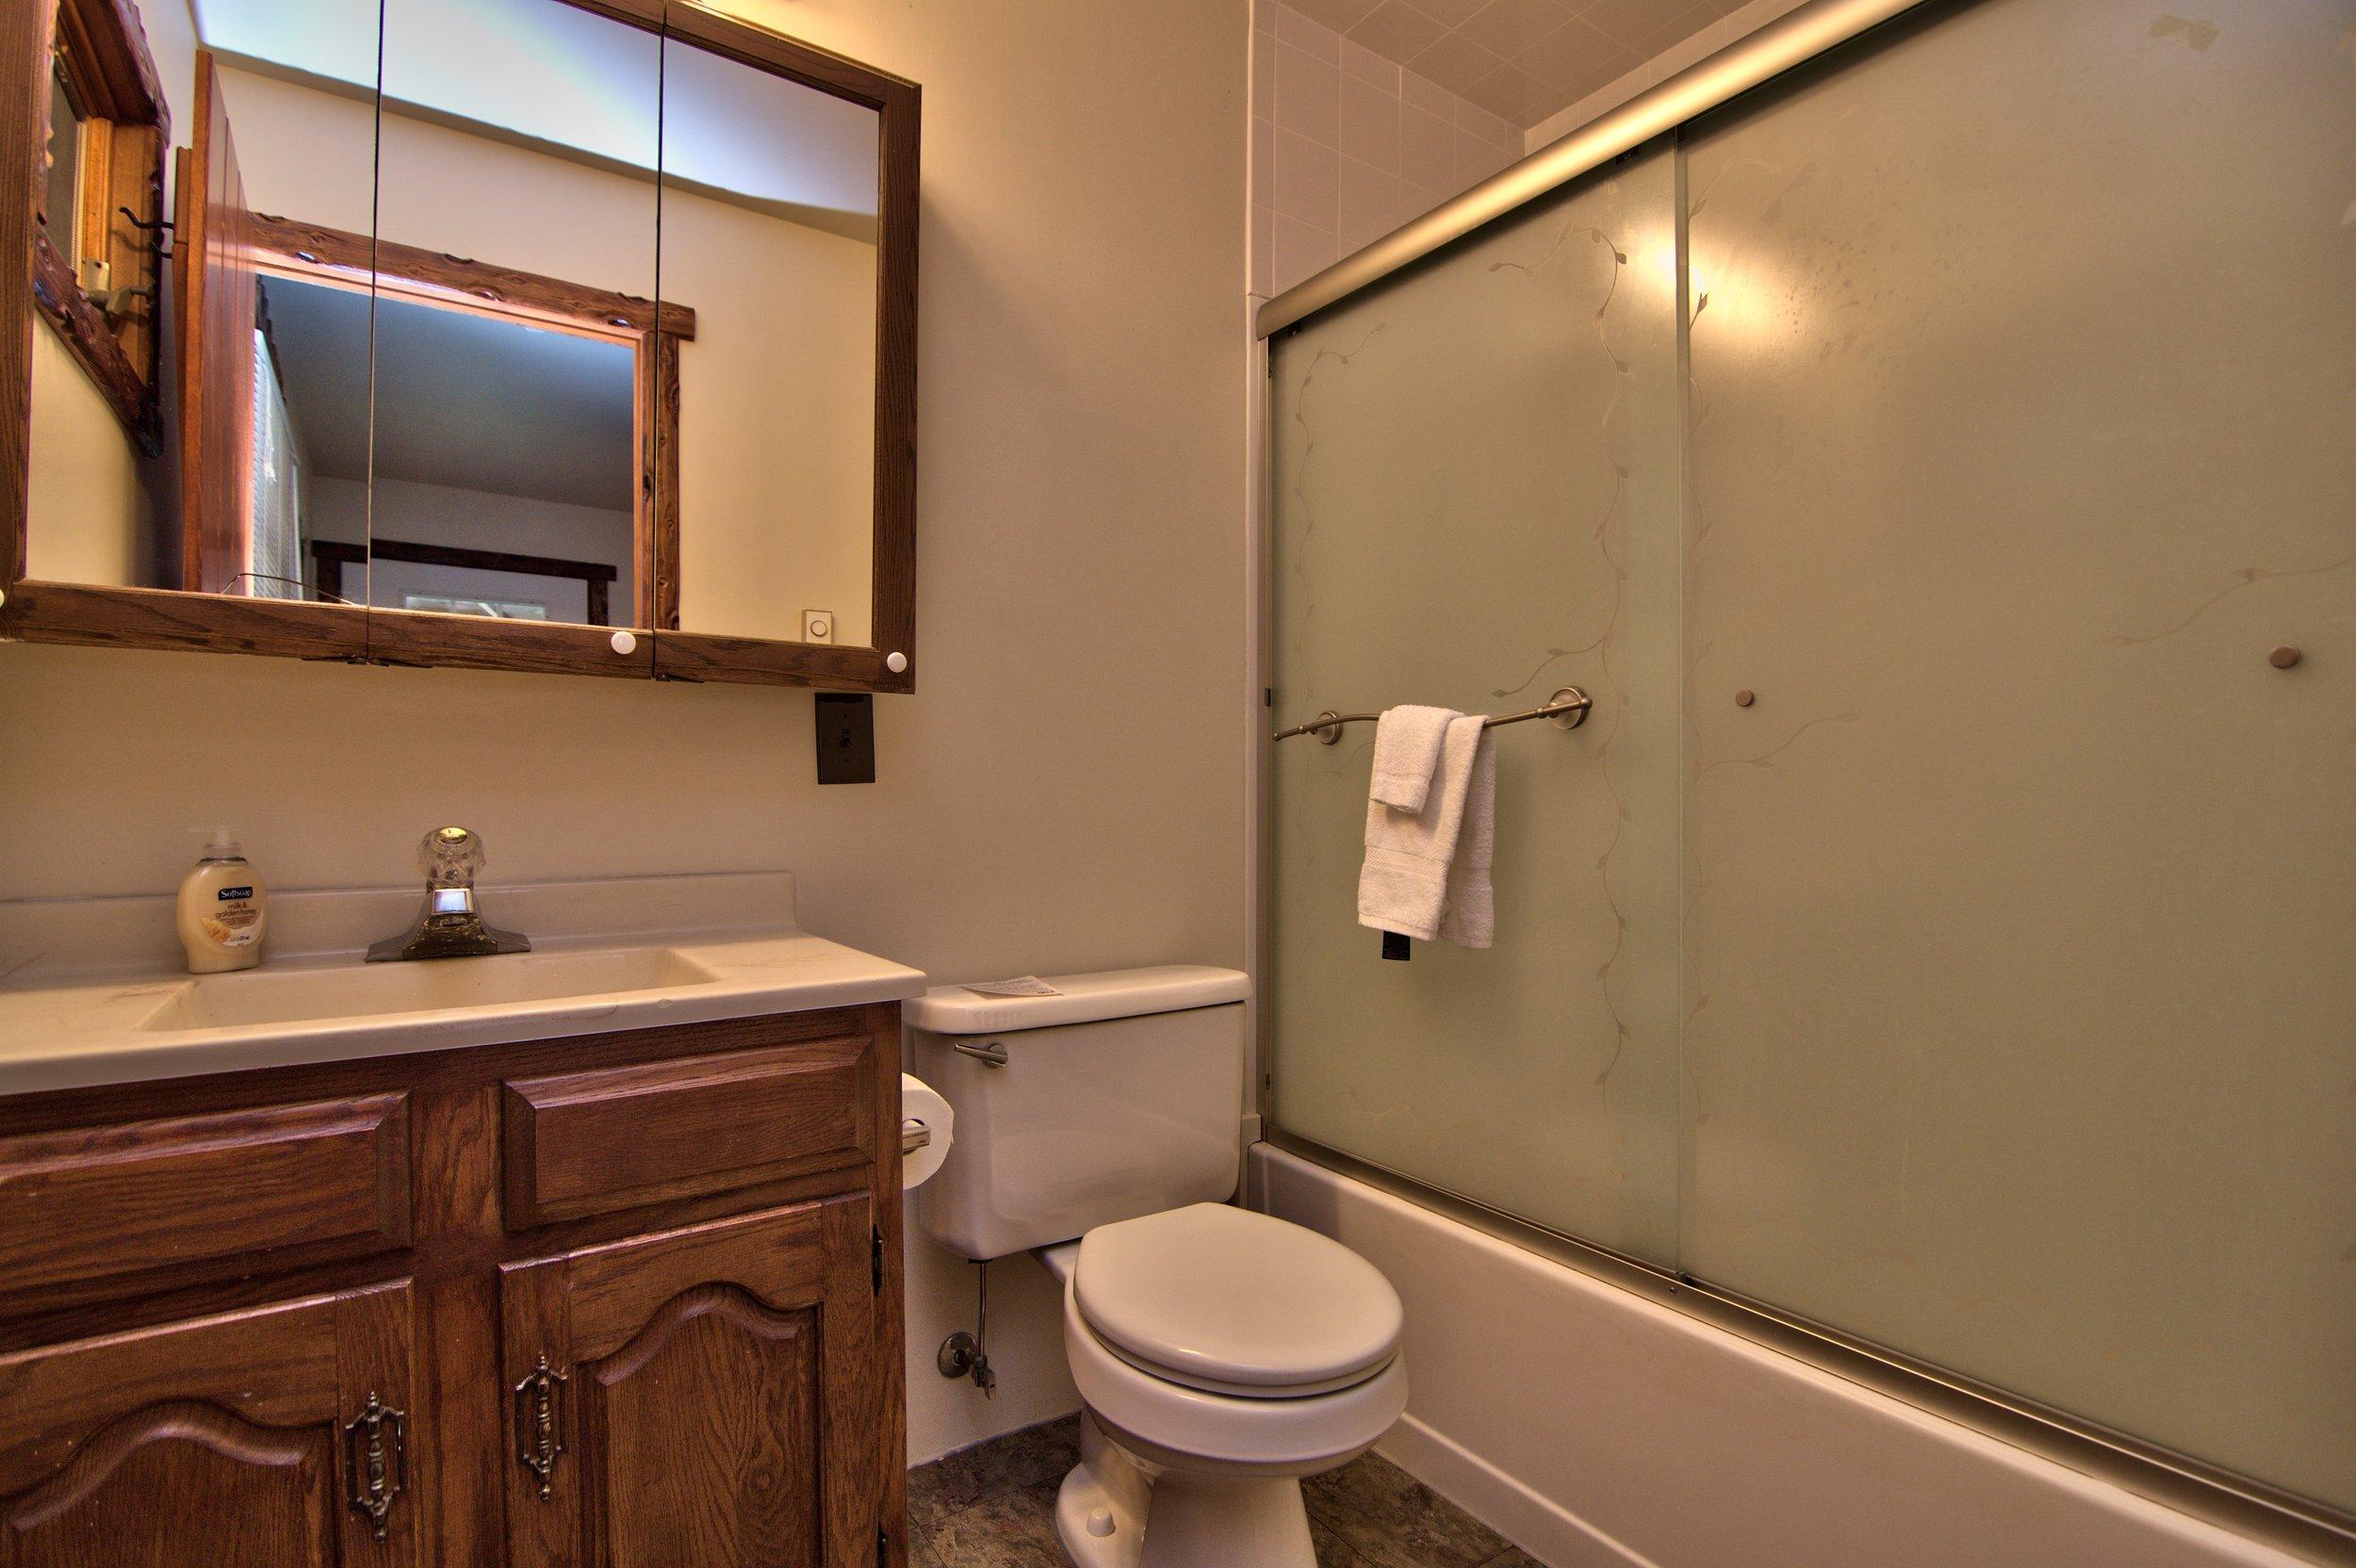 Hall Bath View 1.jpg